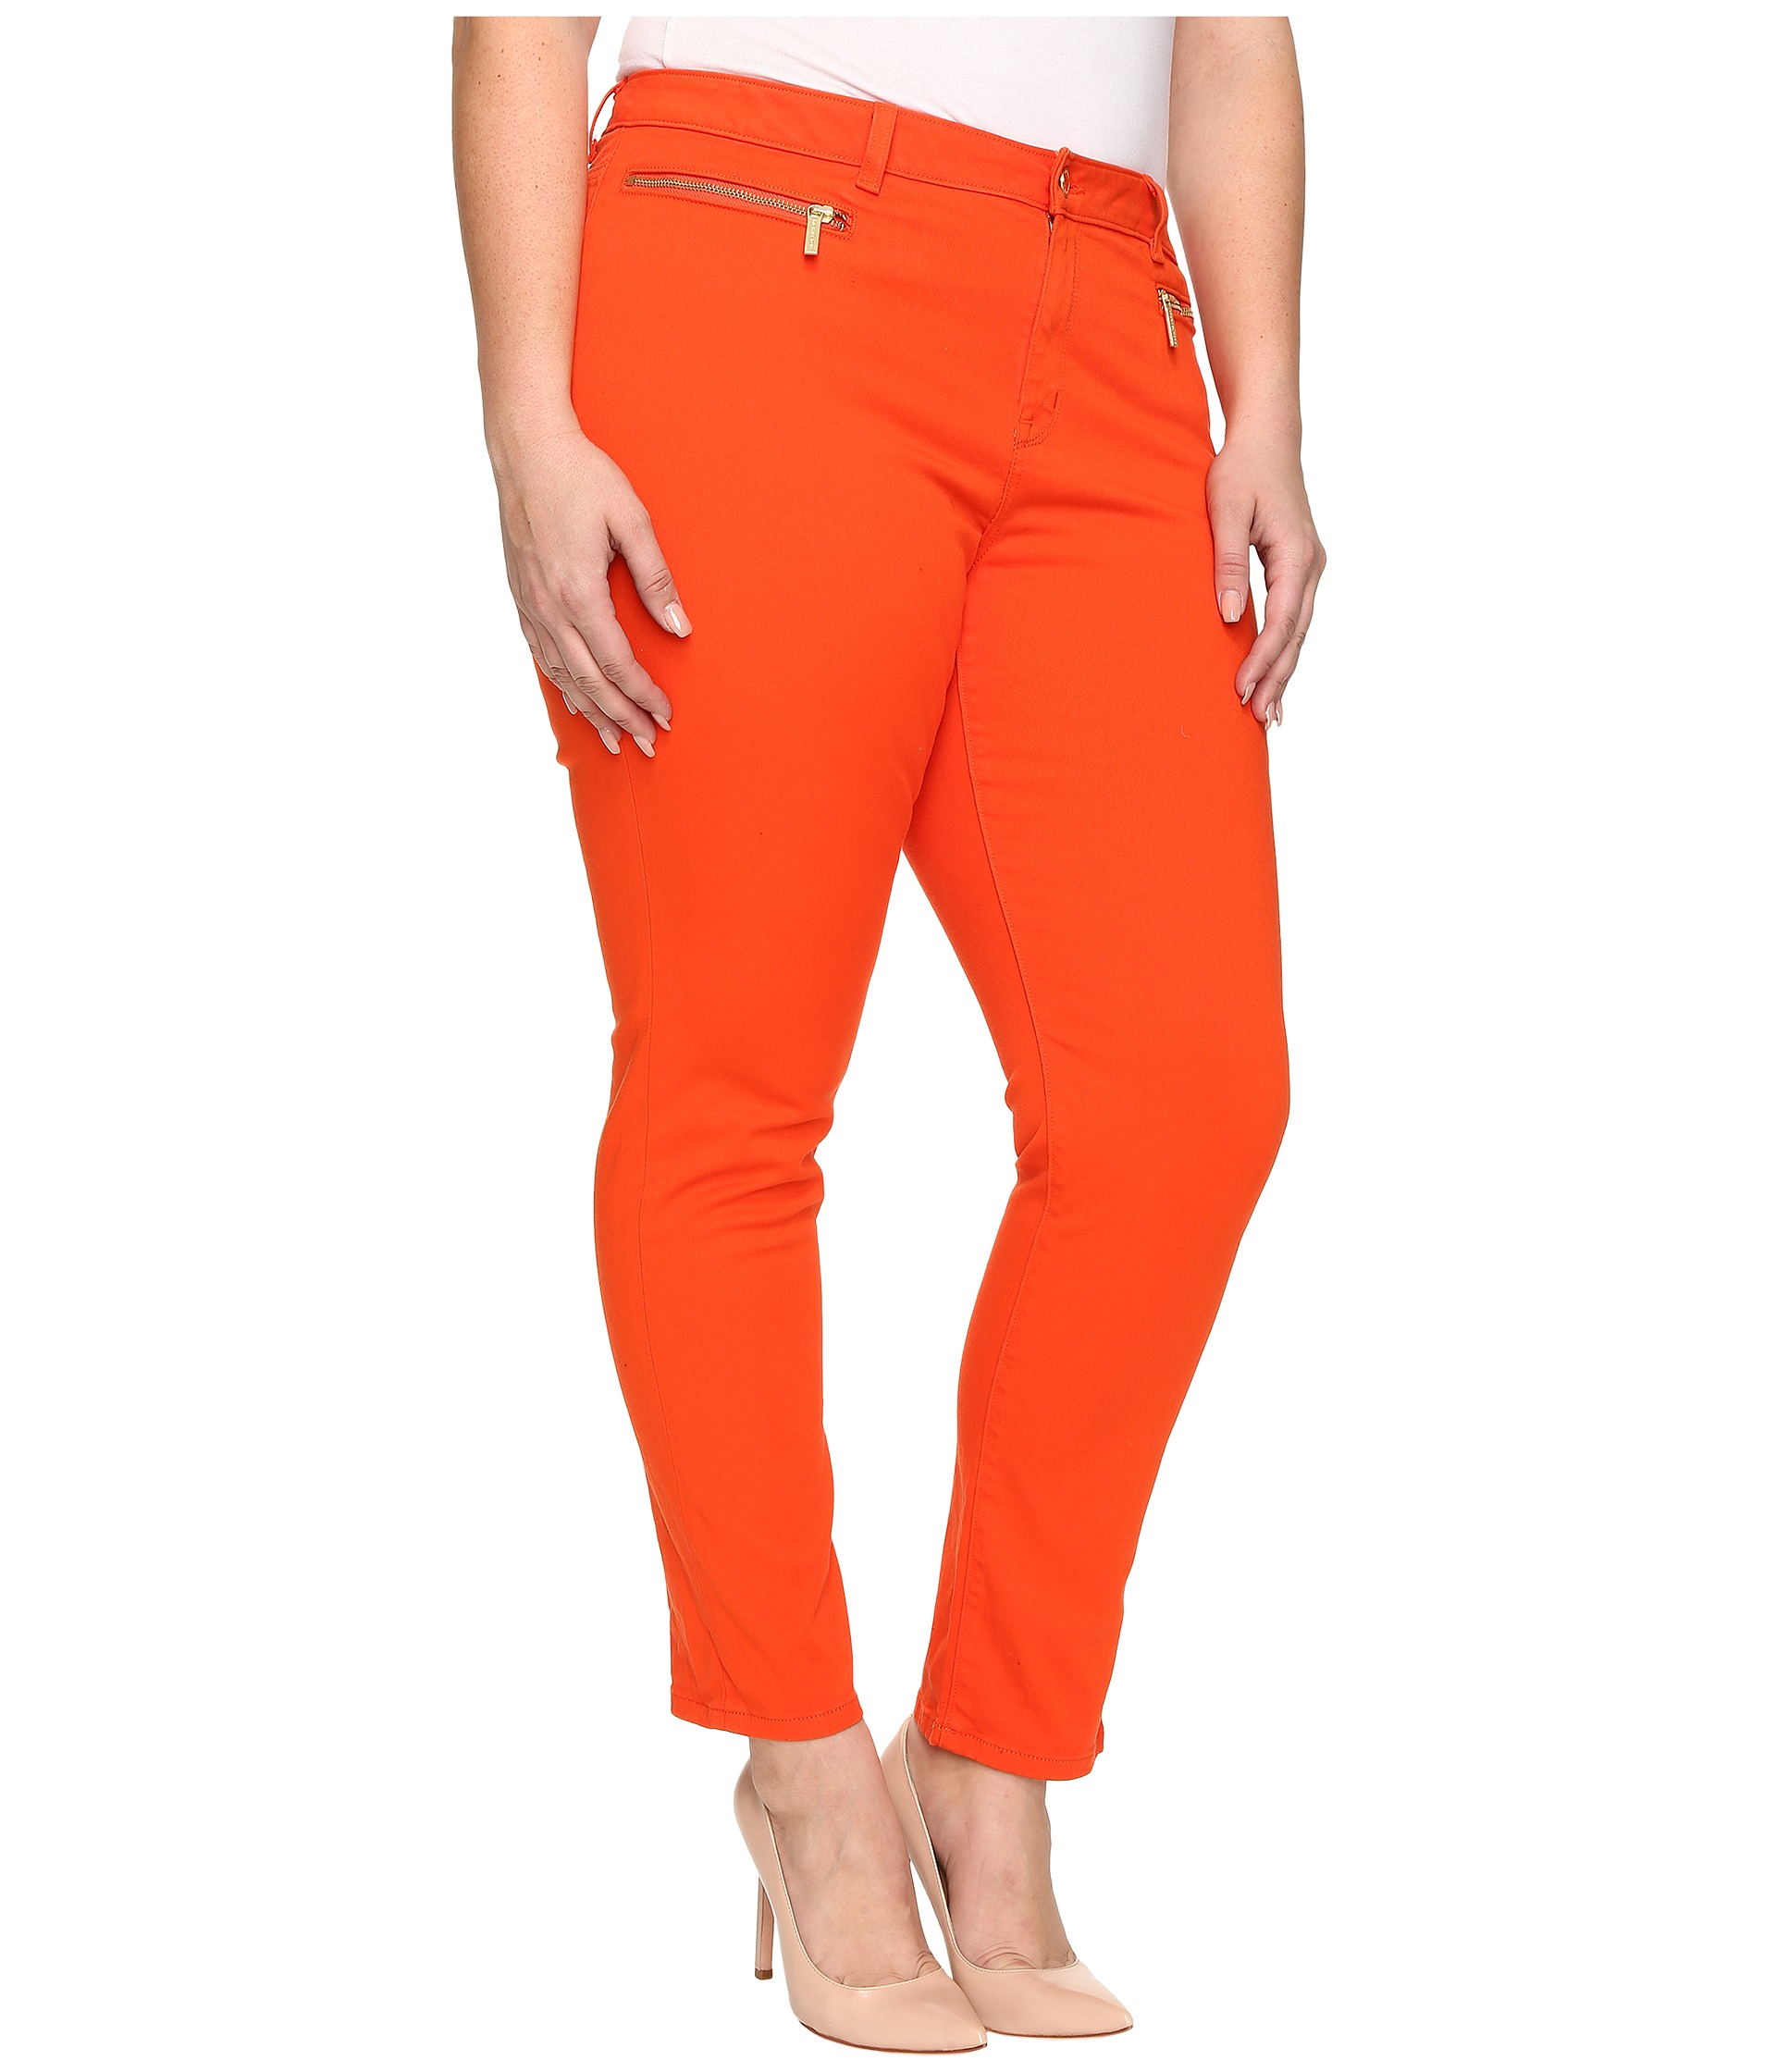 90d6edbe69e21 Orange Skinny Pants - Collections Pants Photo Parkerforsenate.Org